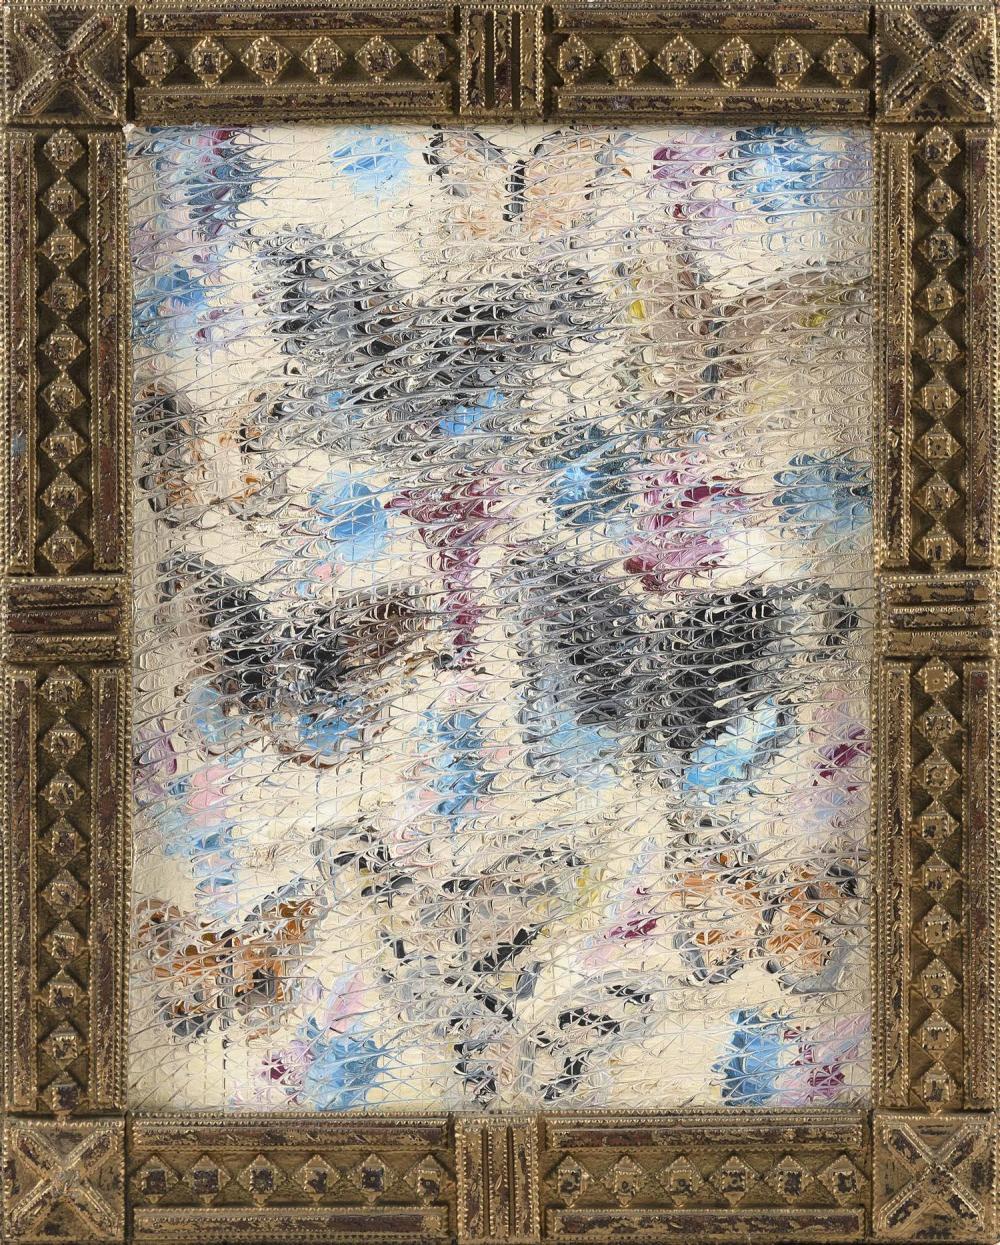 "HUNT SLONEM, New York, b. 1951, ""Butterflies""., Oil on board, 18.5"" x 14"". Framed 23"" x 18""."